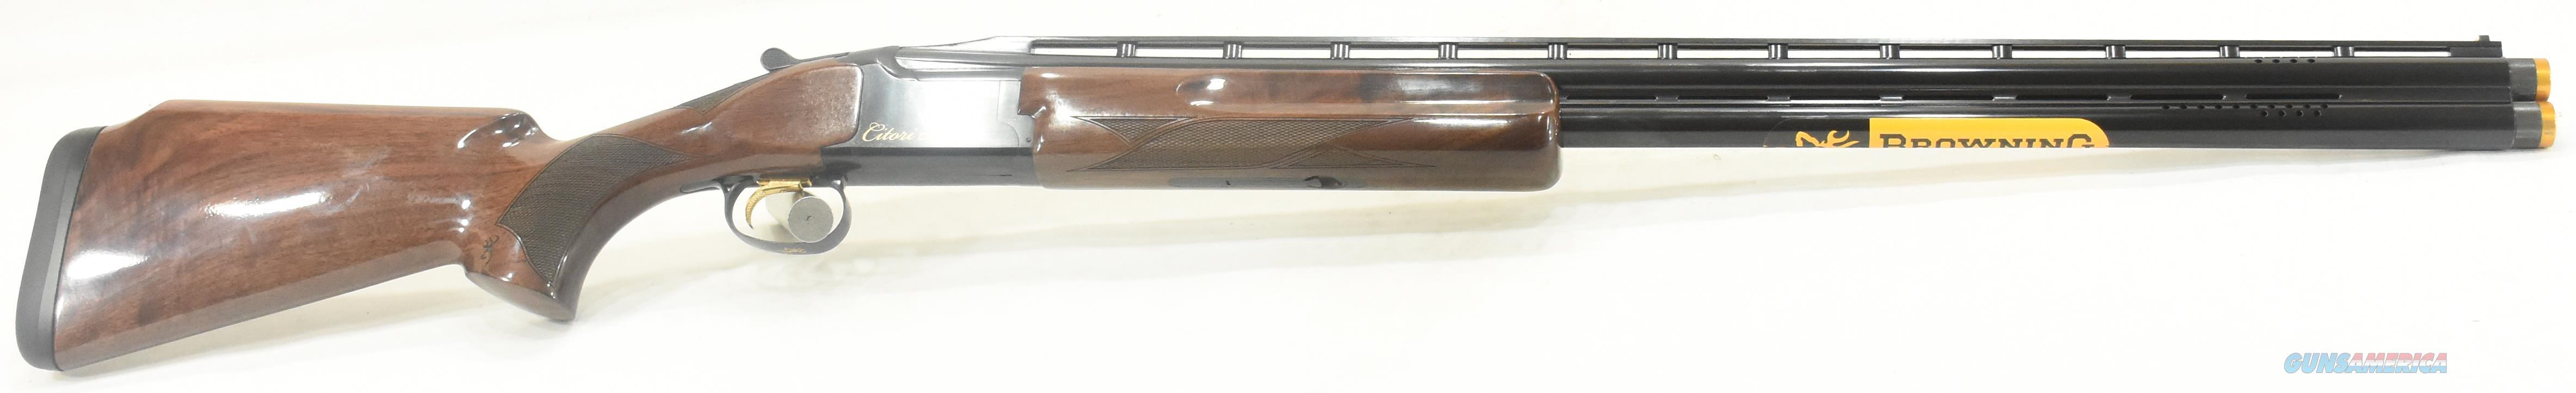 Citori CXT 12Ga 30-3In 018074326  Guns > Shotguns > Browning Shotguns > Over Unders > Citori > Hunting